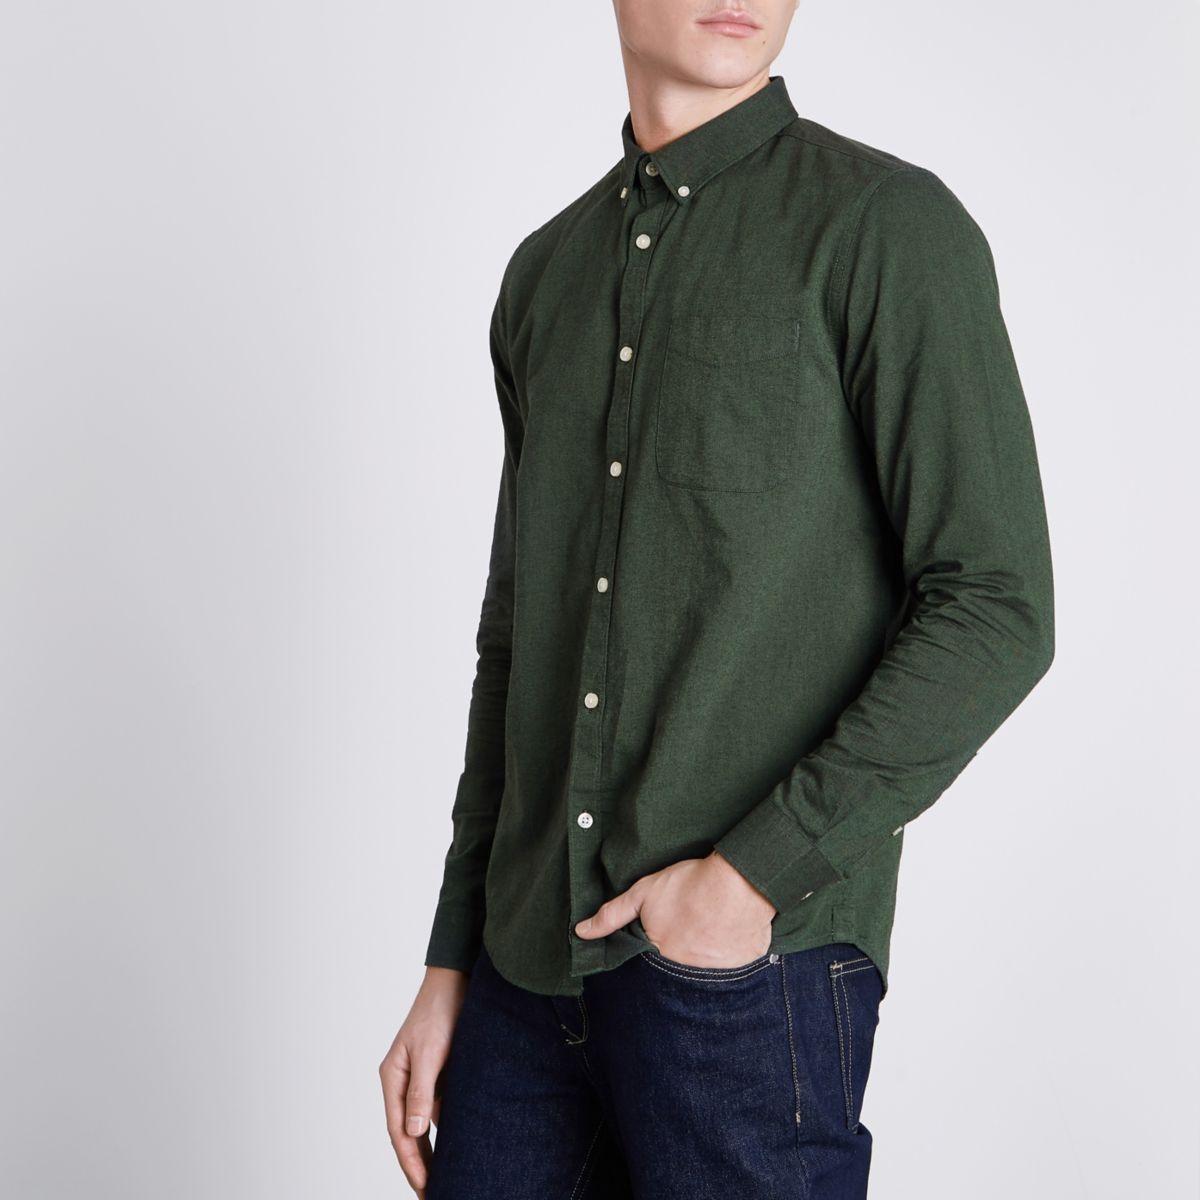 Green button-down casual Oxford shirt